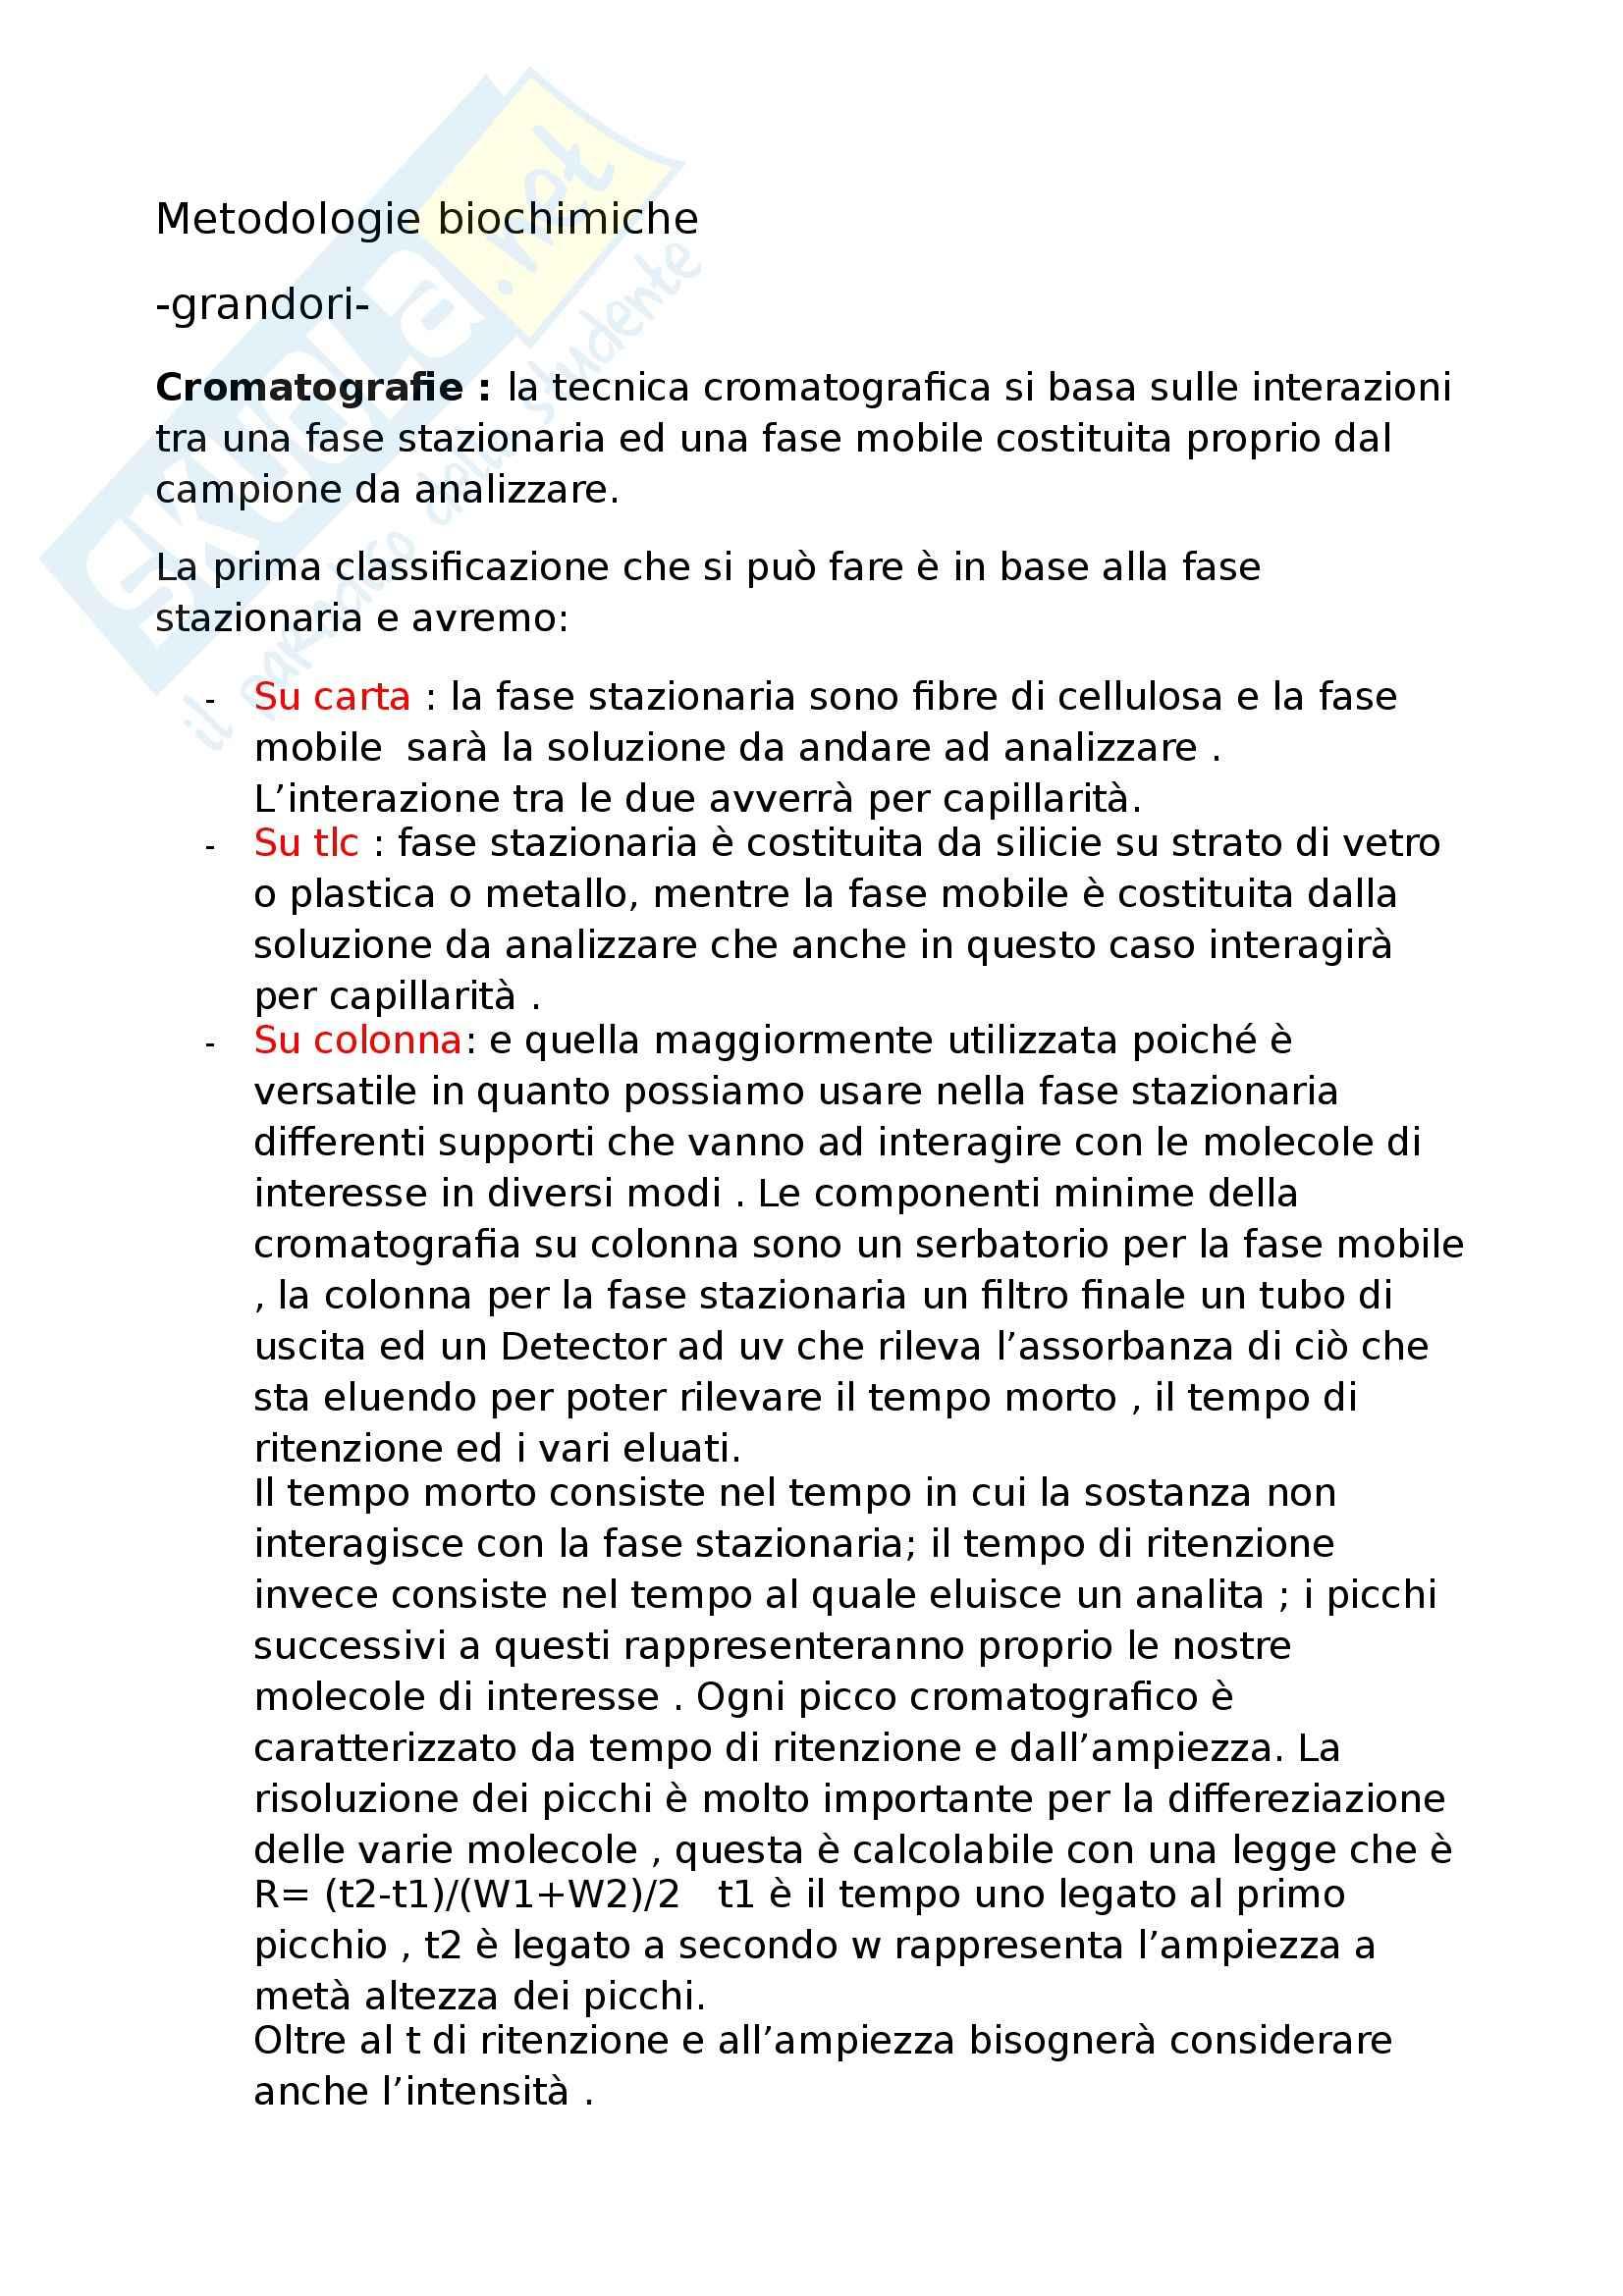 Metodologie biochimiche - Appunti